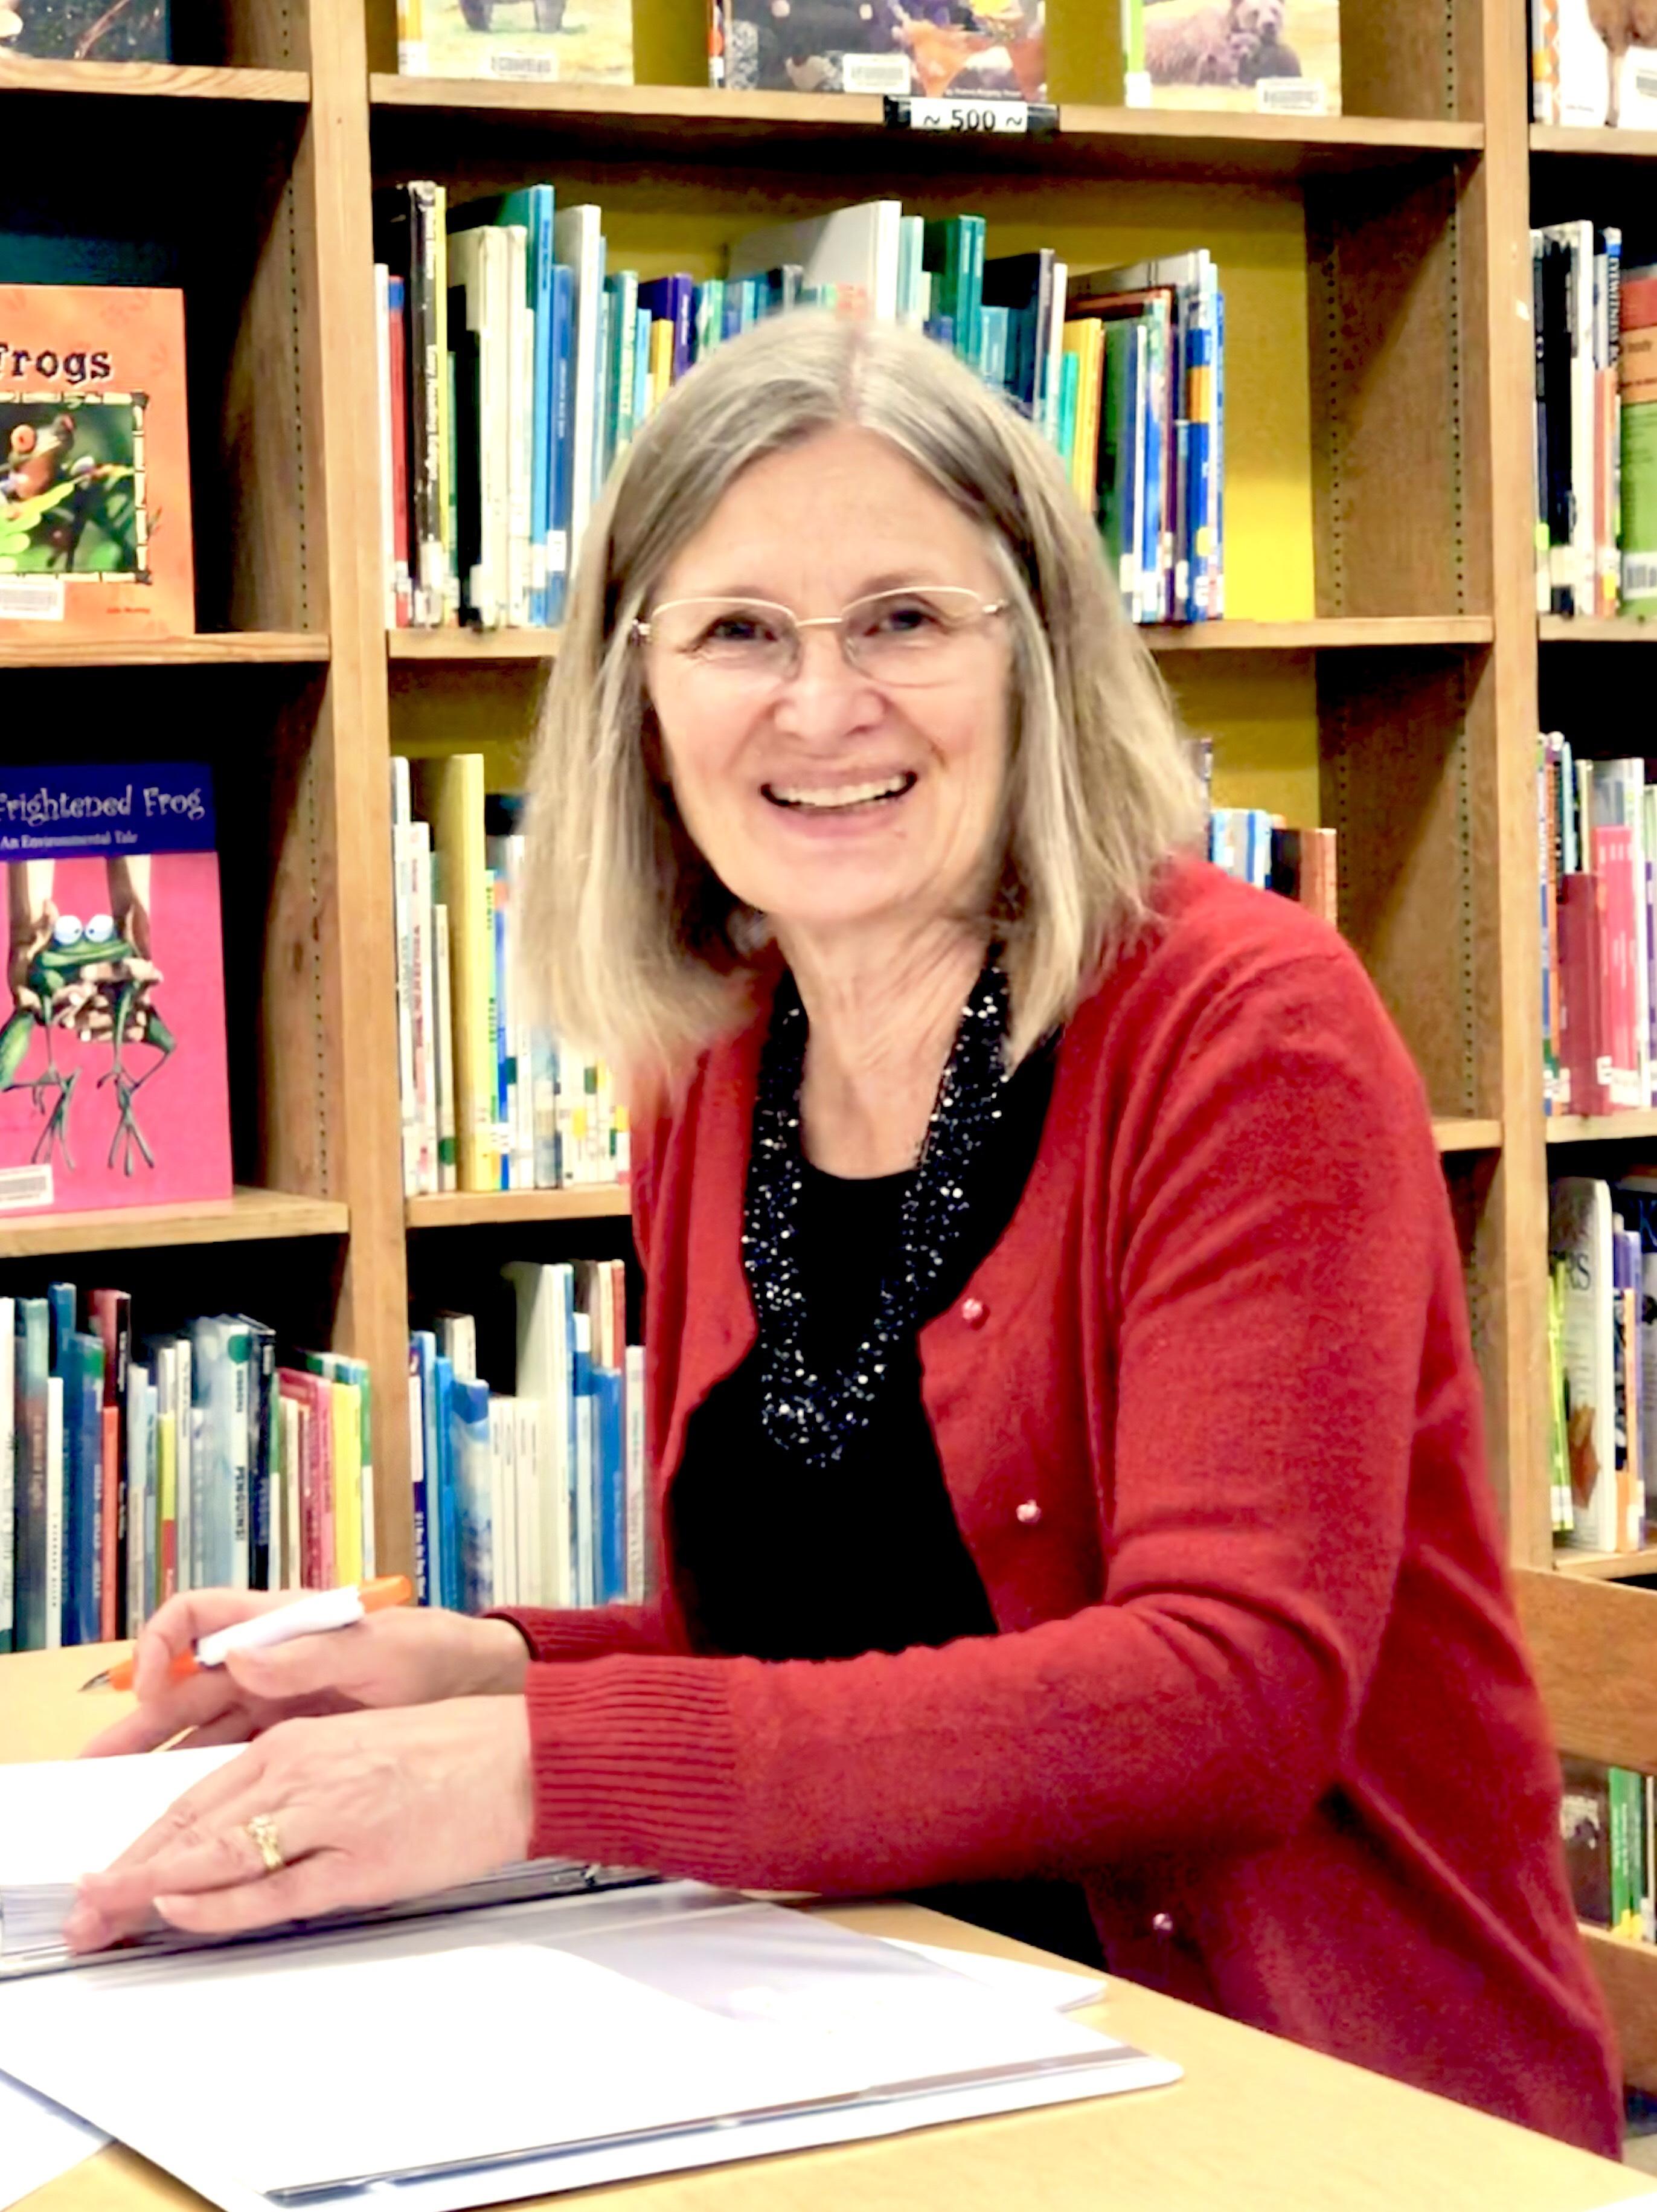 Linda Vickery